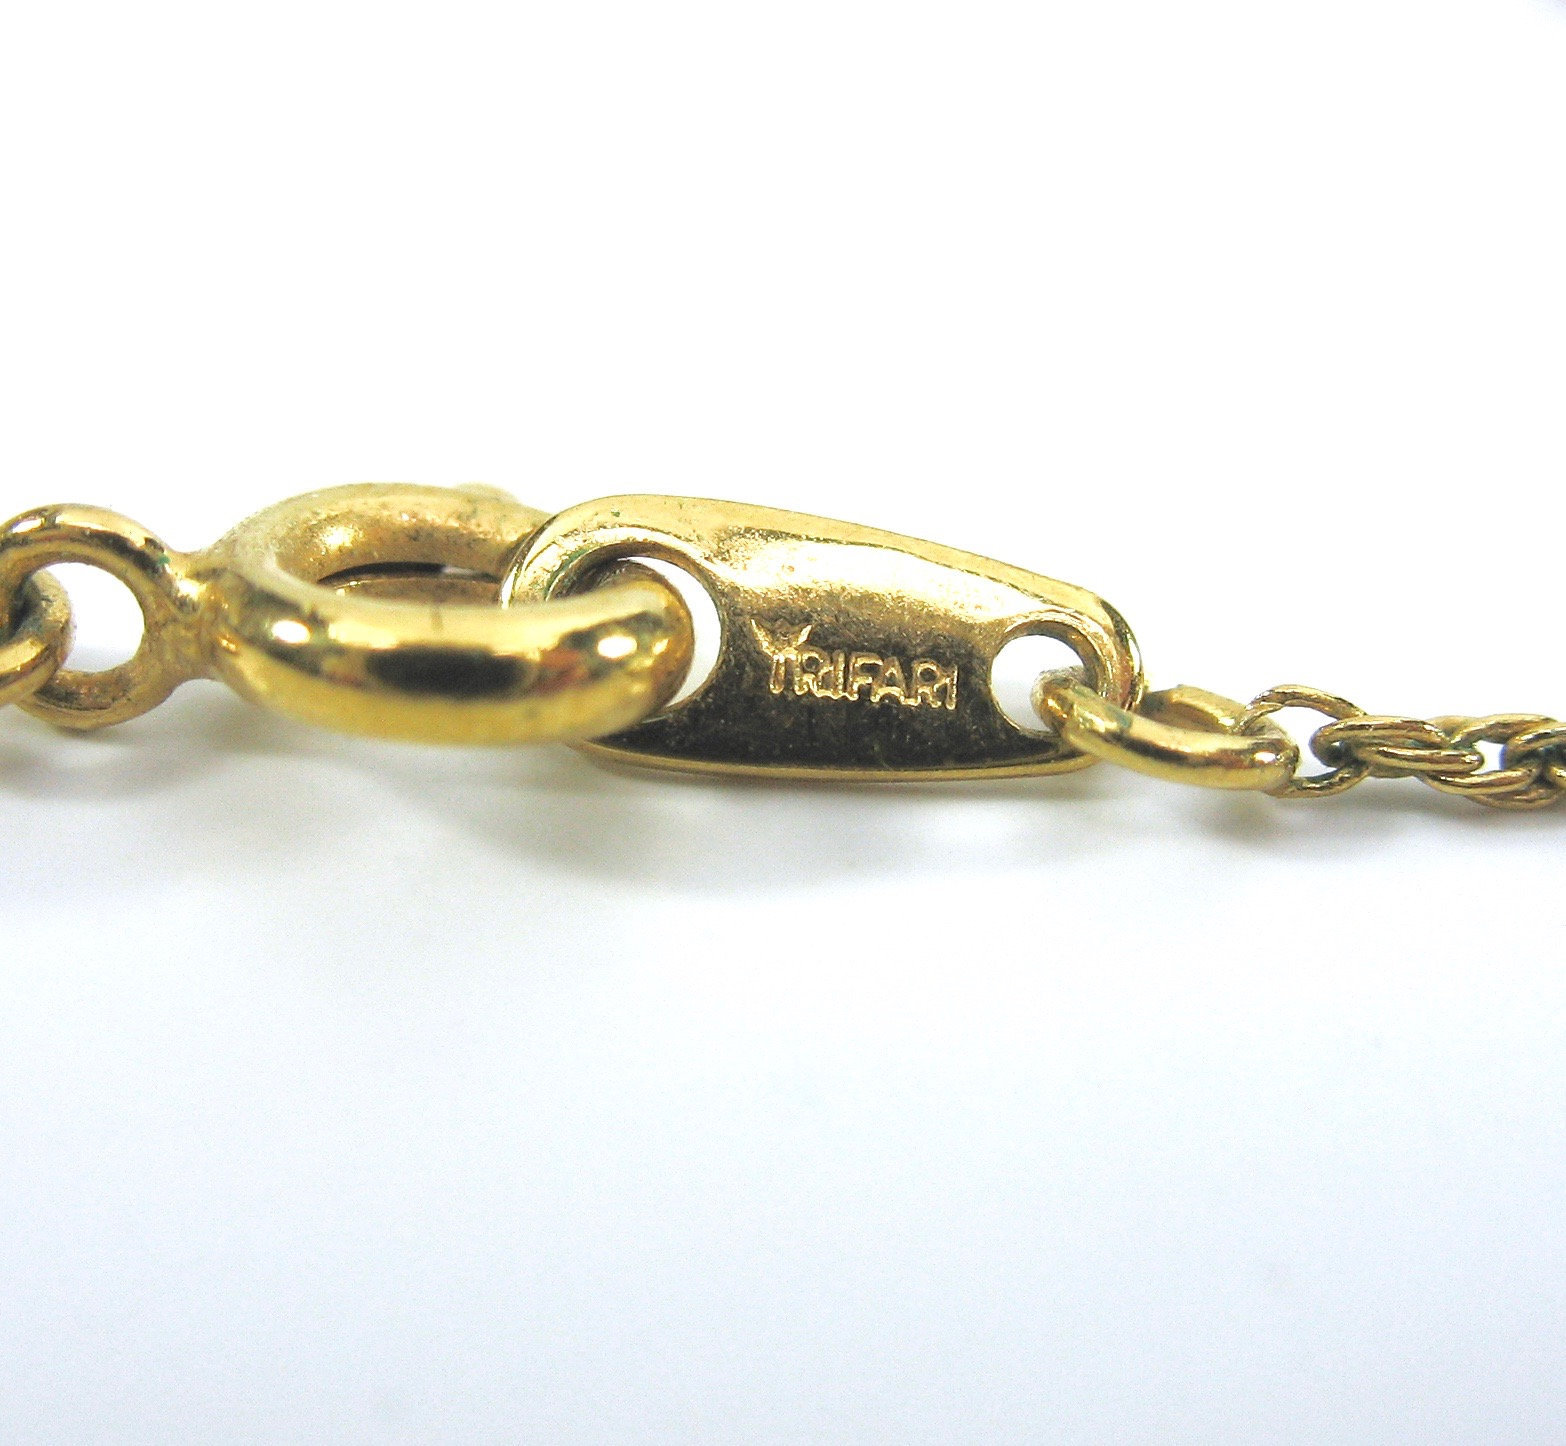 Crown Trifari Cameo Pendant Necklace, Victorian Revival, Signed, 1970s, Gold Ton